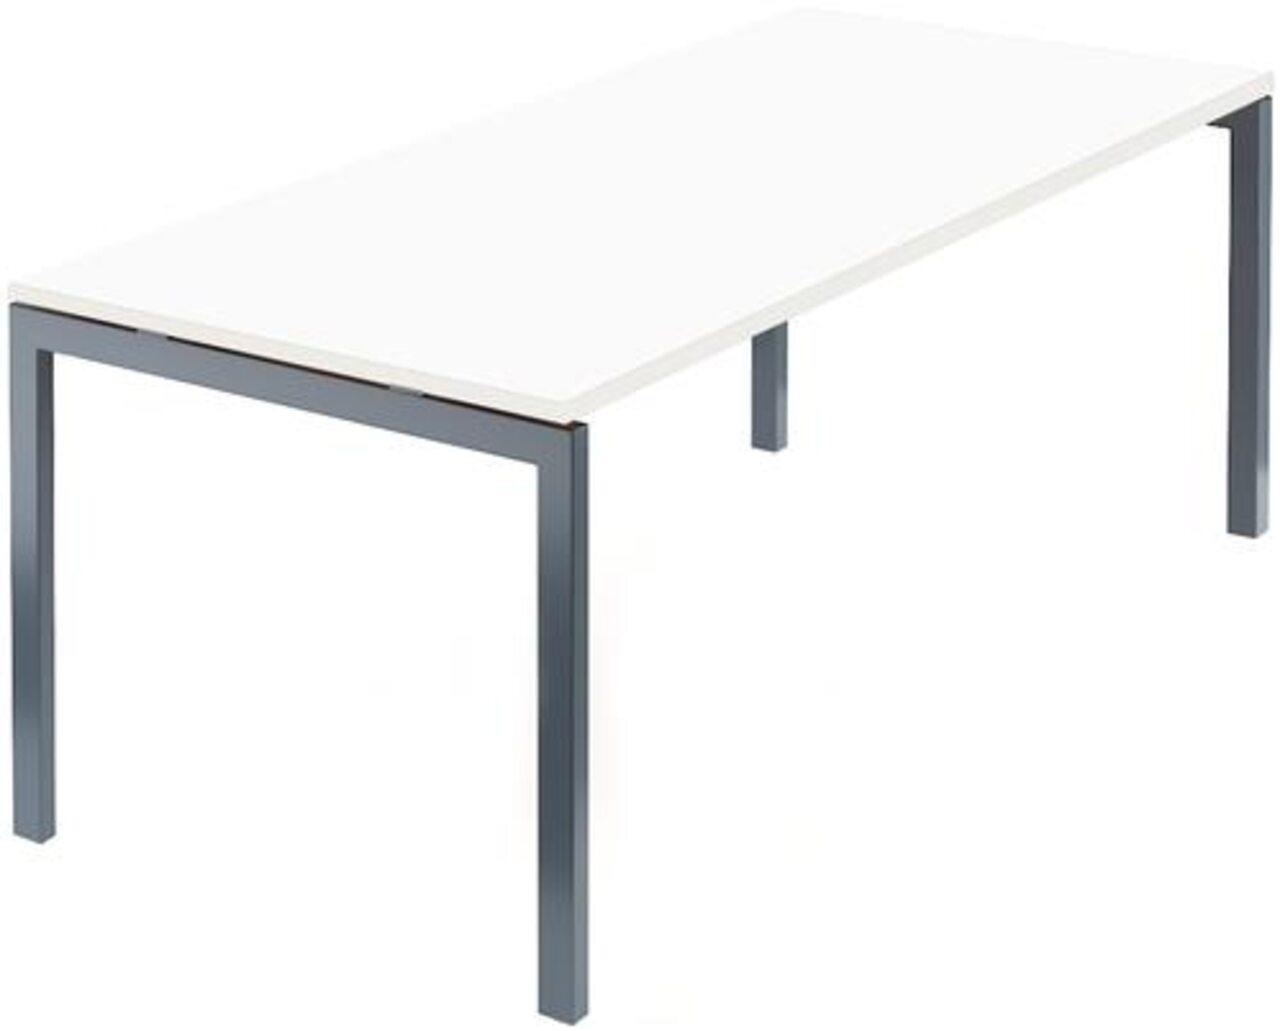 Стол на м/каркасе для заседаний/антрацит Арго 180x85x76 - фото 1